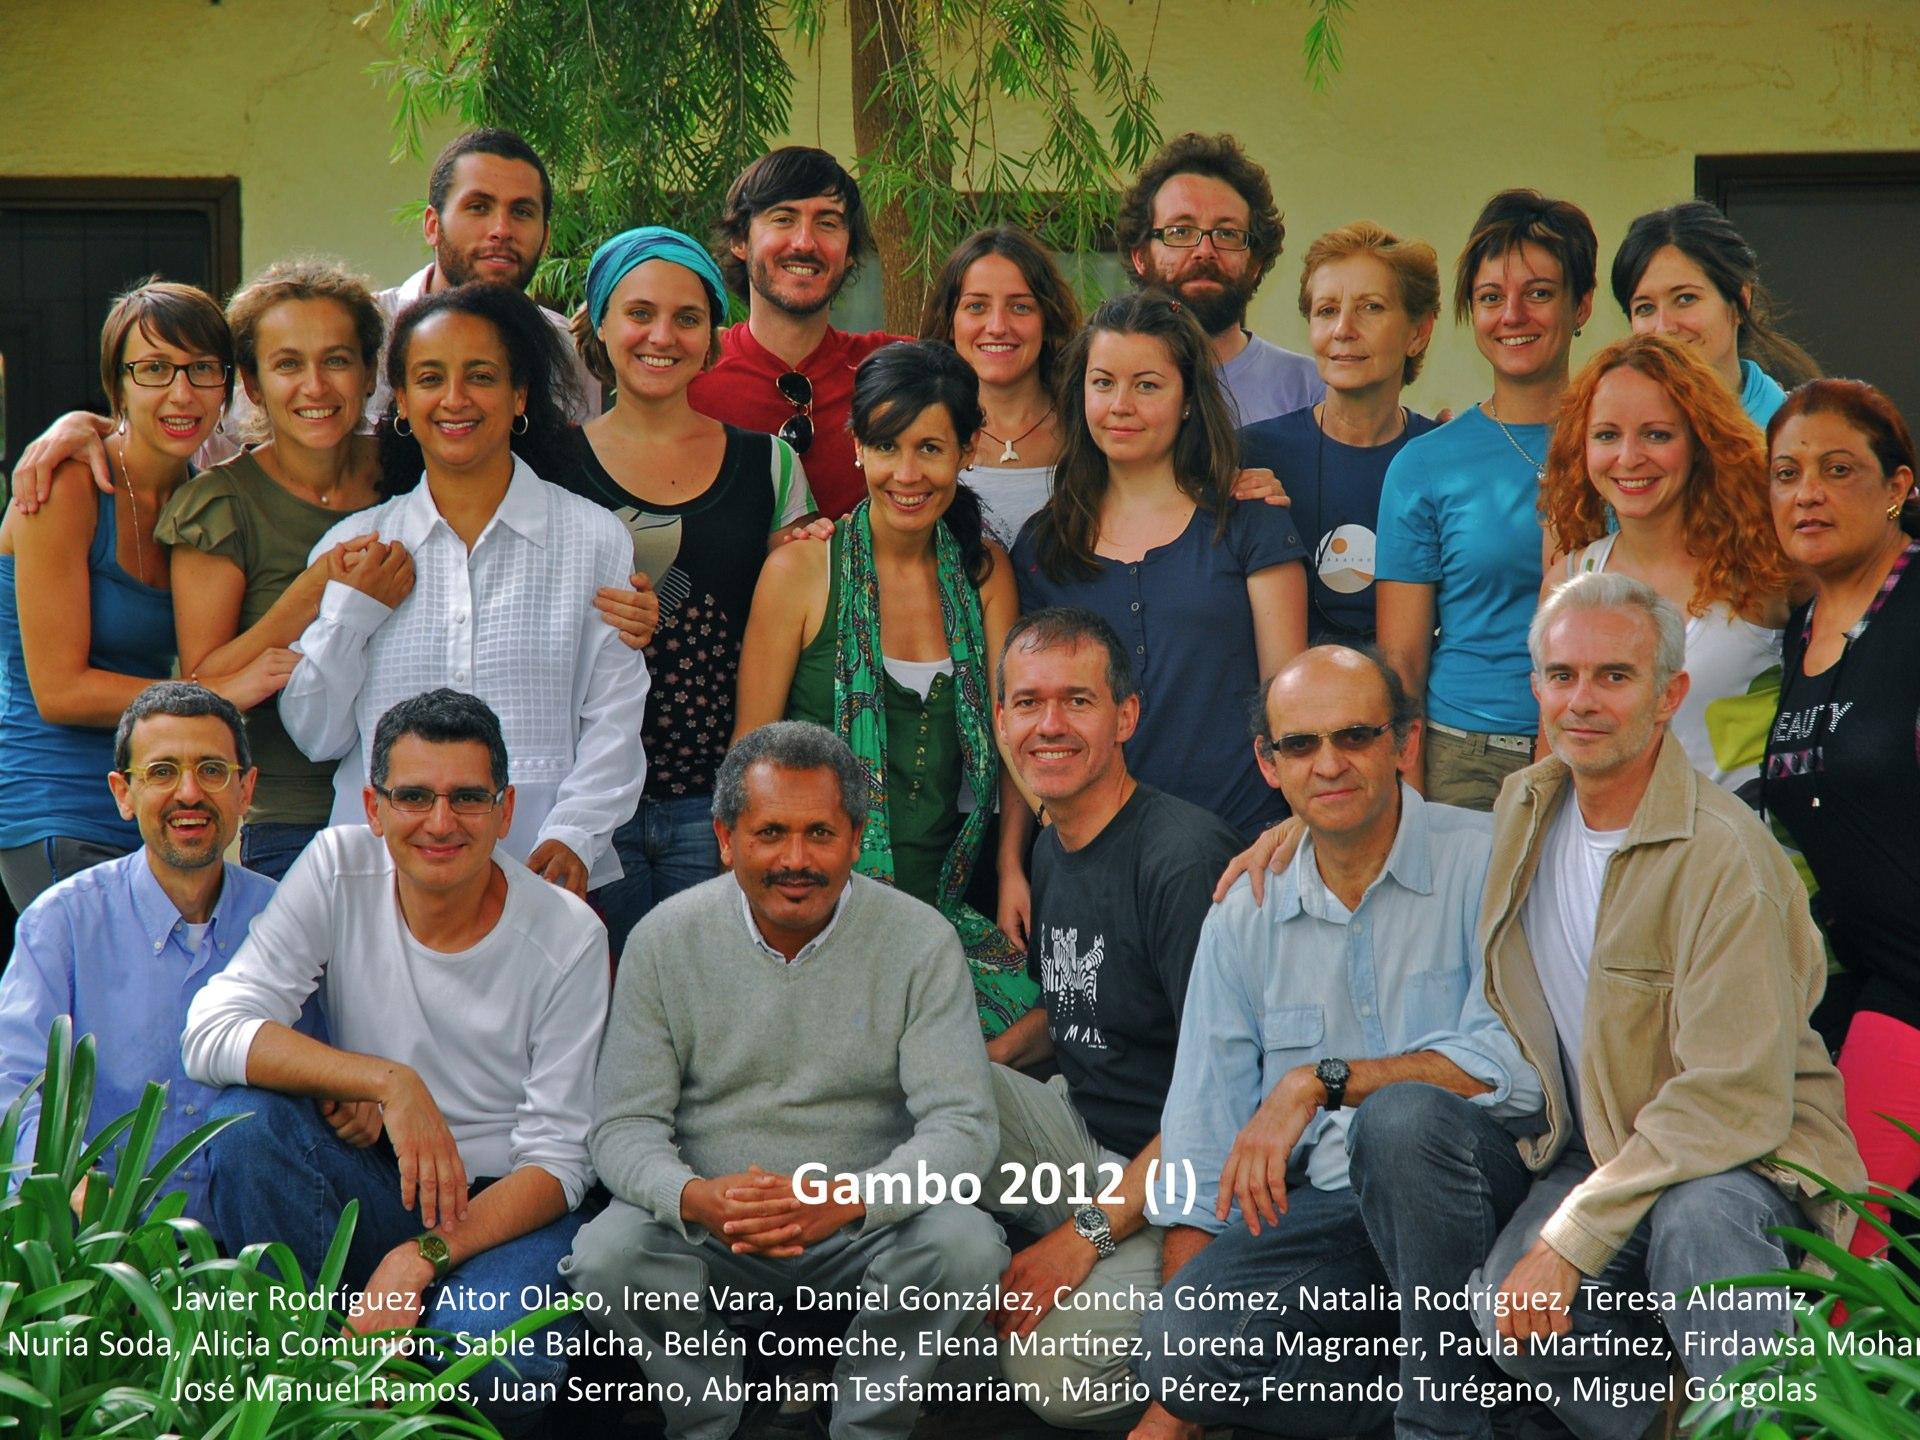 Gambo 2012 A foto grupo